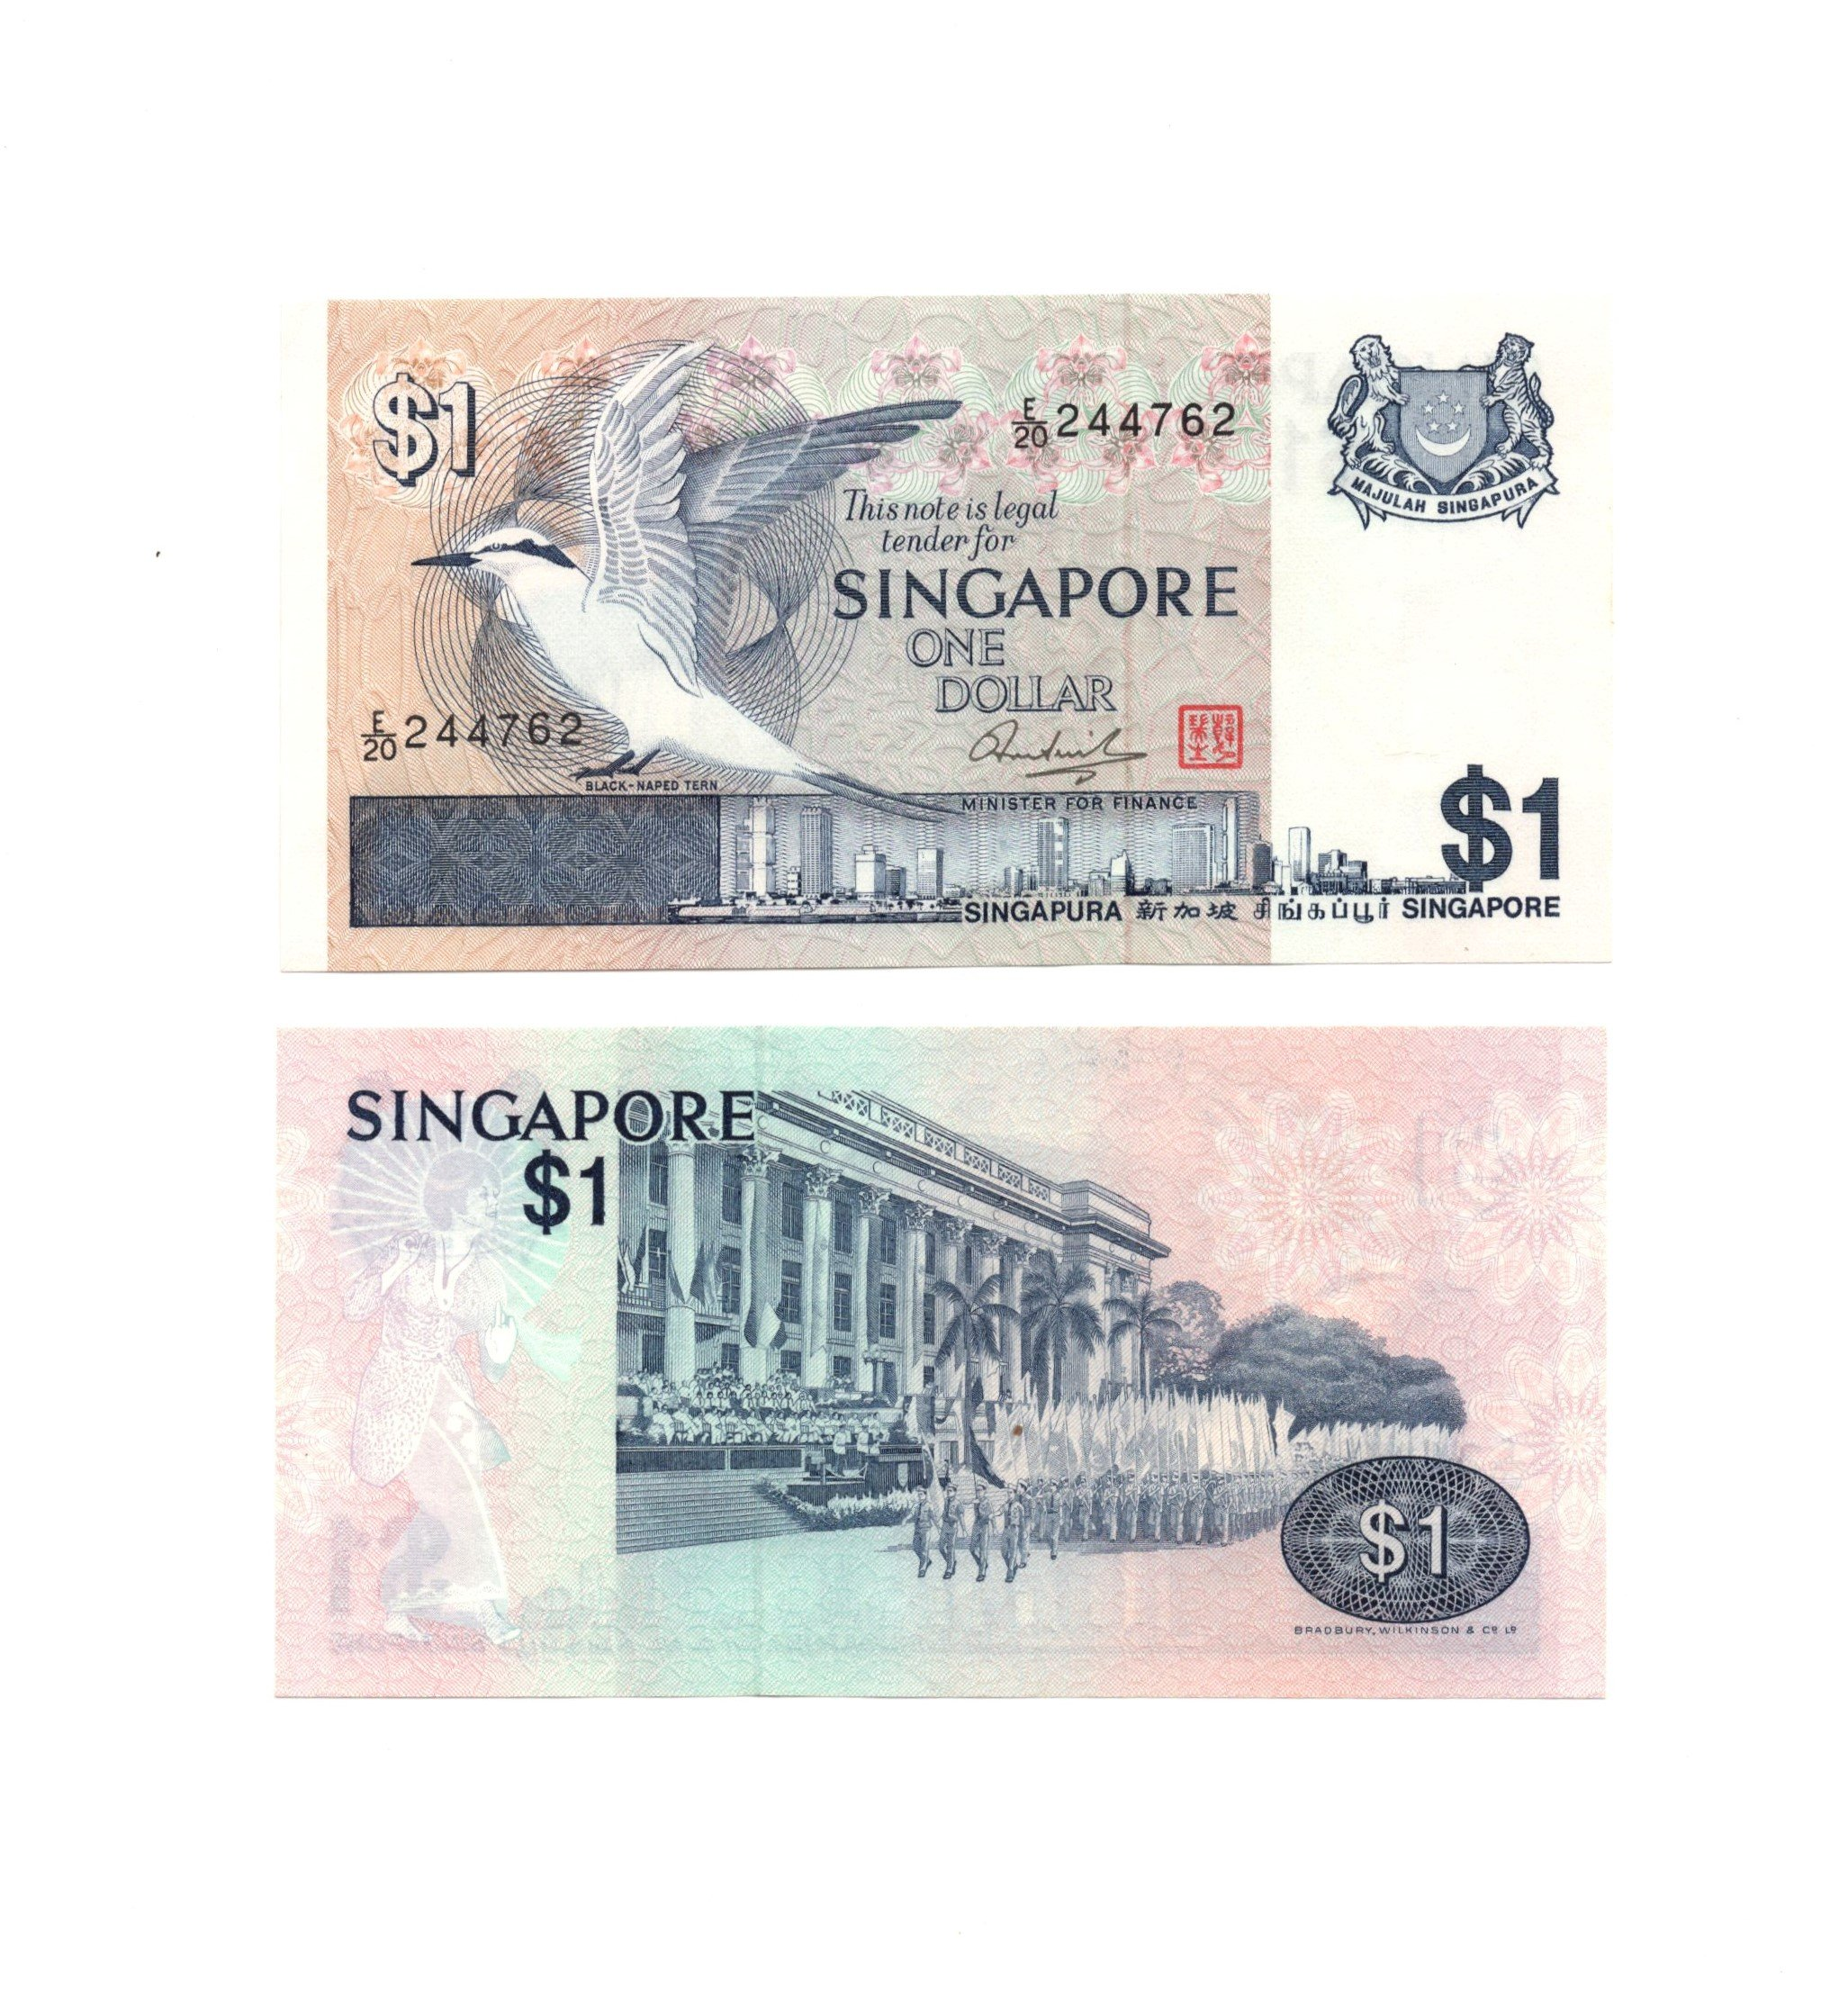 Singapore 1 dollar bird